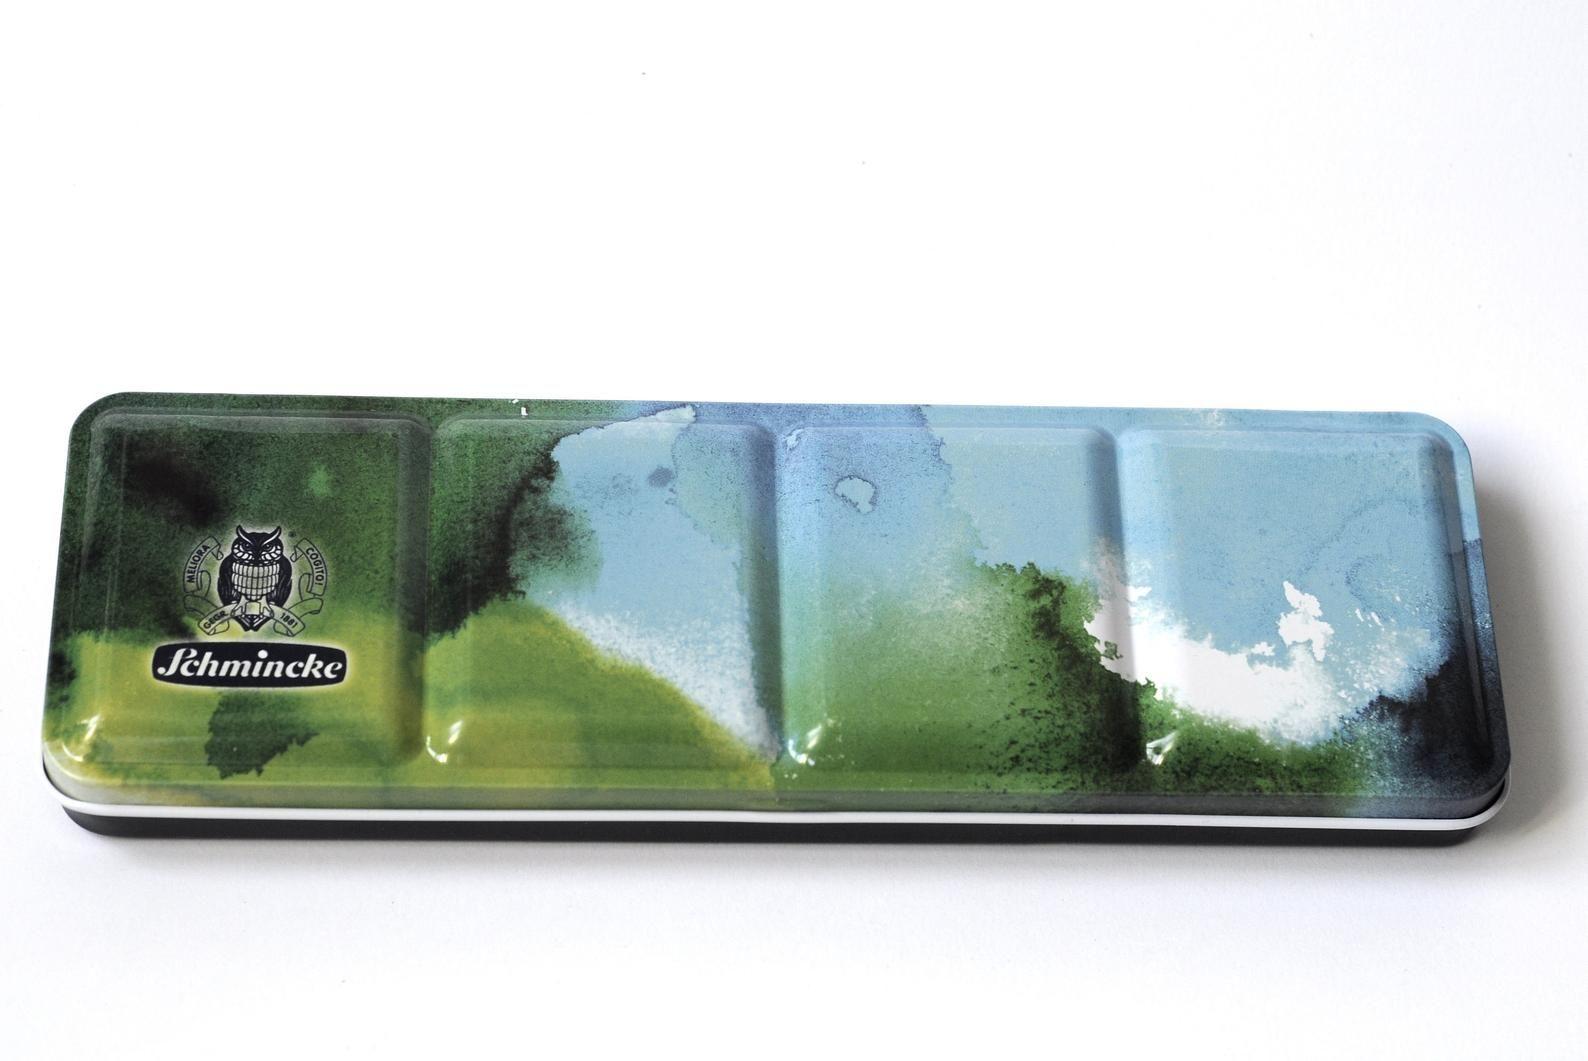 Schmincke Akademie Watercolor Palette Ocean Blue Special Edition